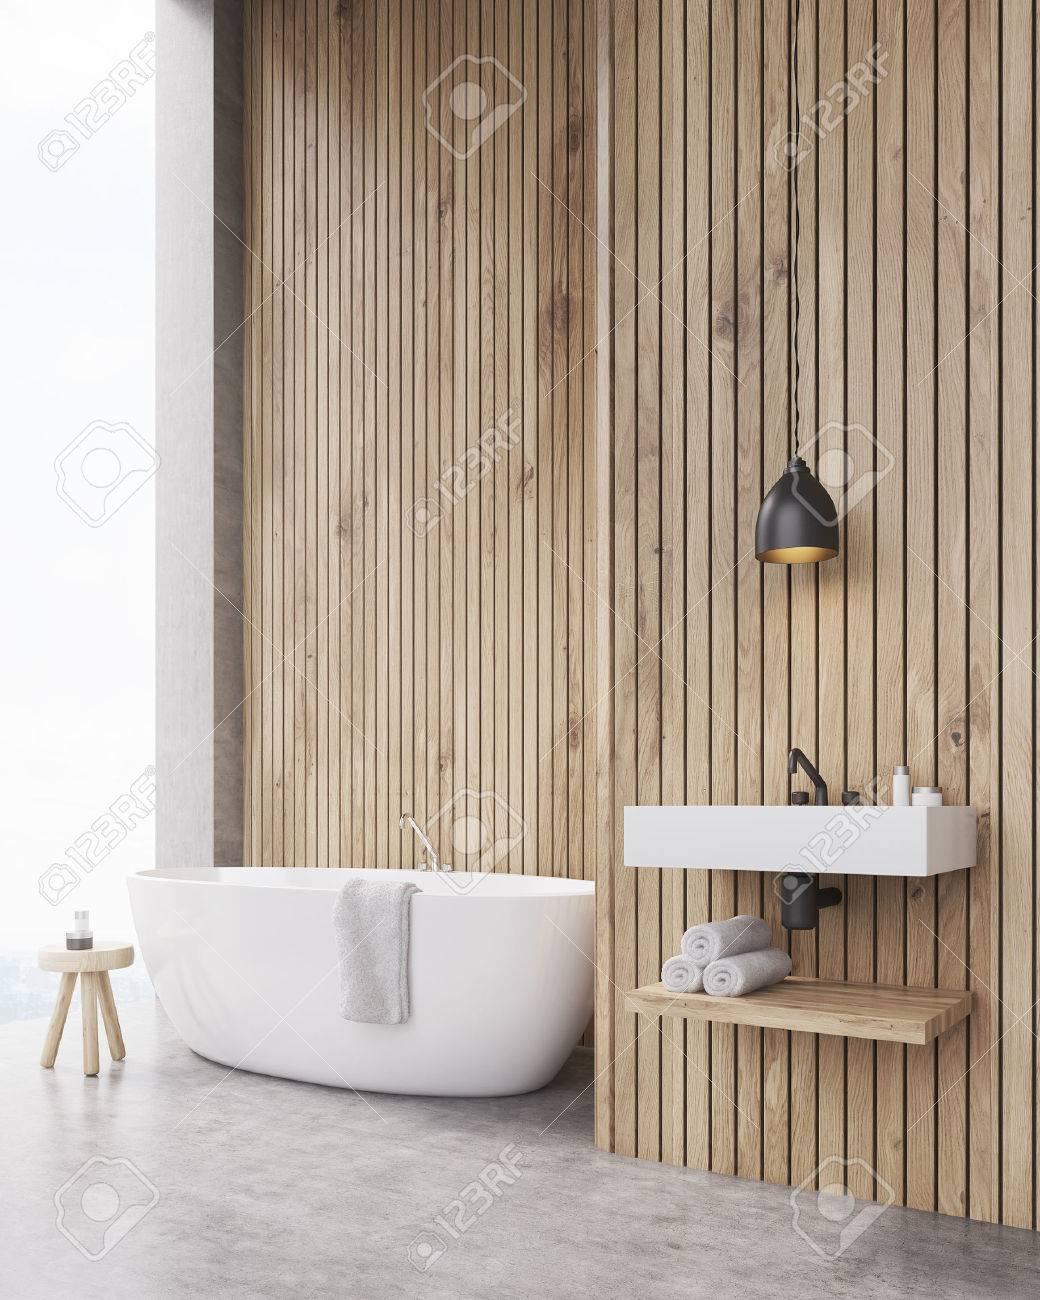 Foto de archivo - Interior de baño con paredes de madera b4bf6fab4e89